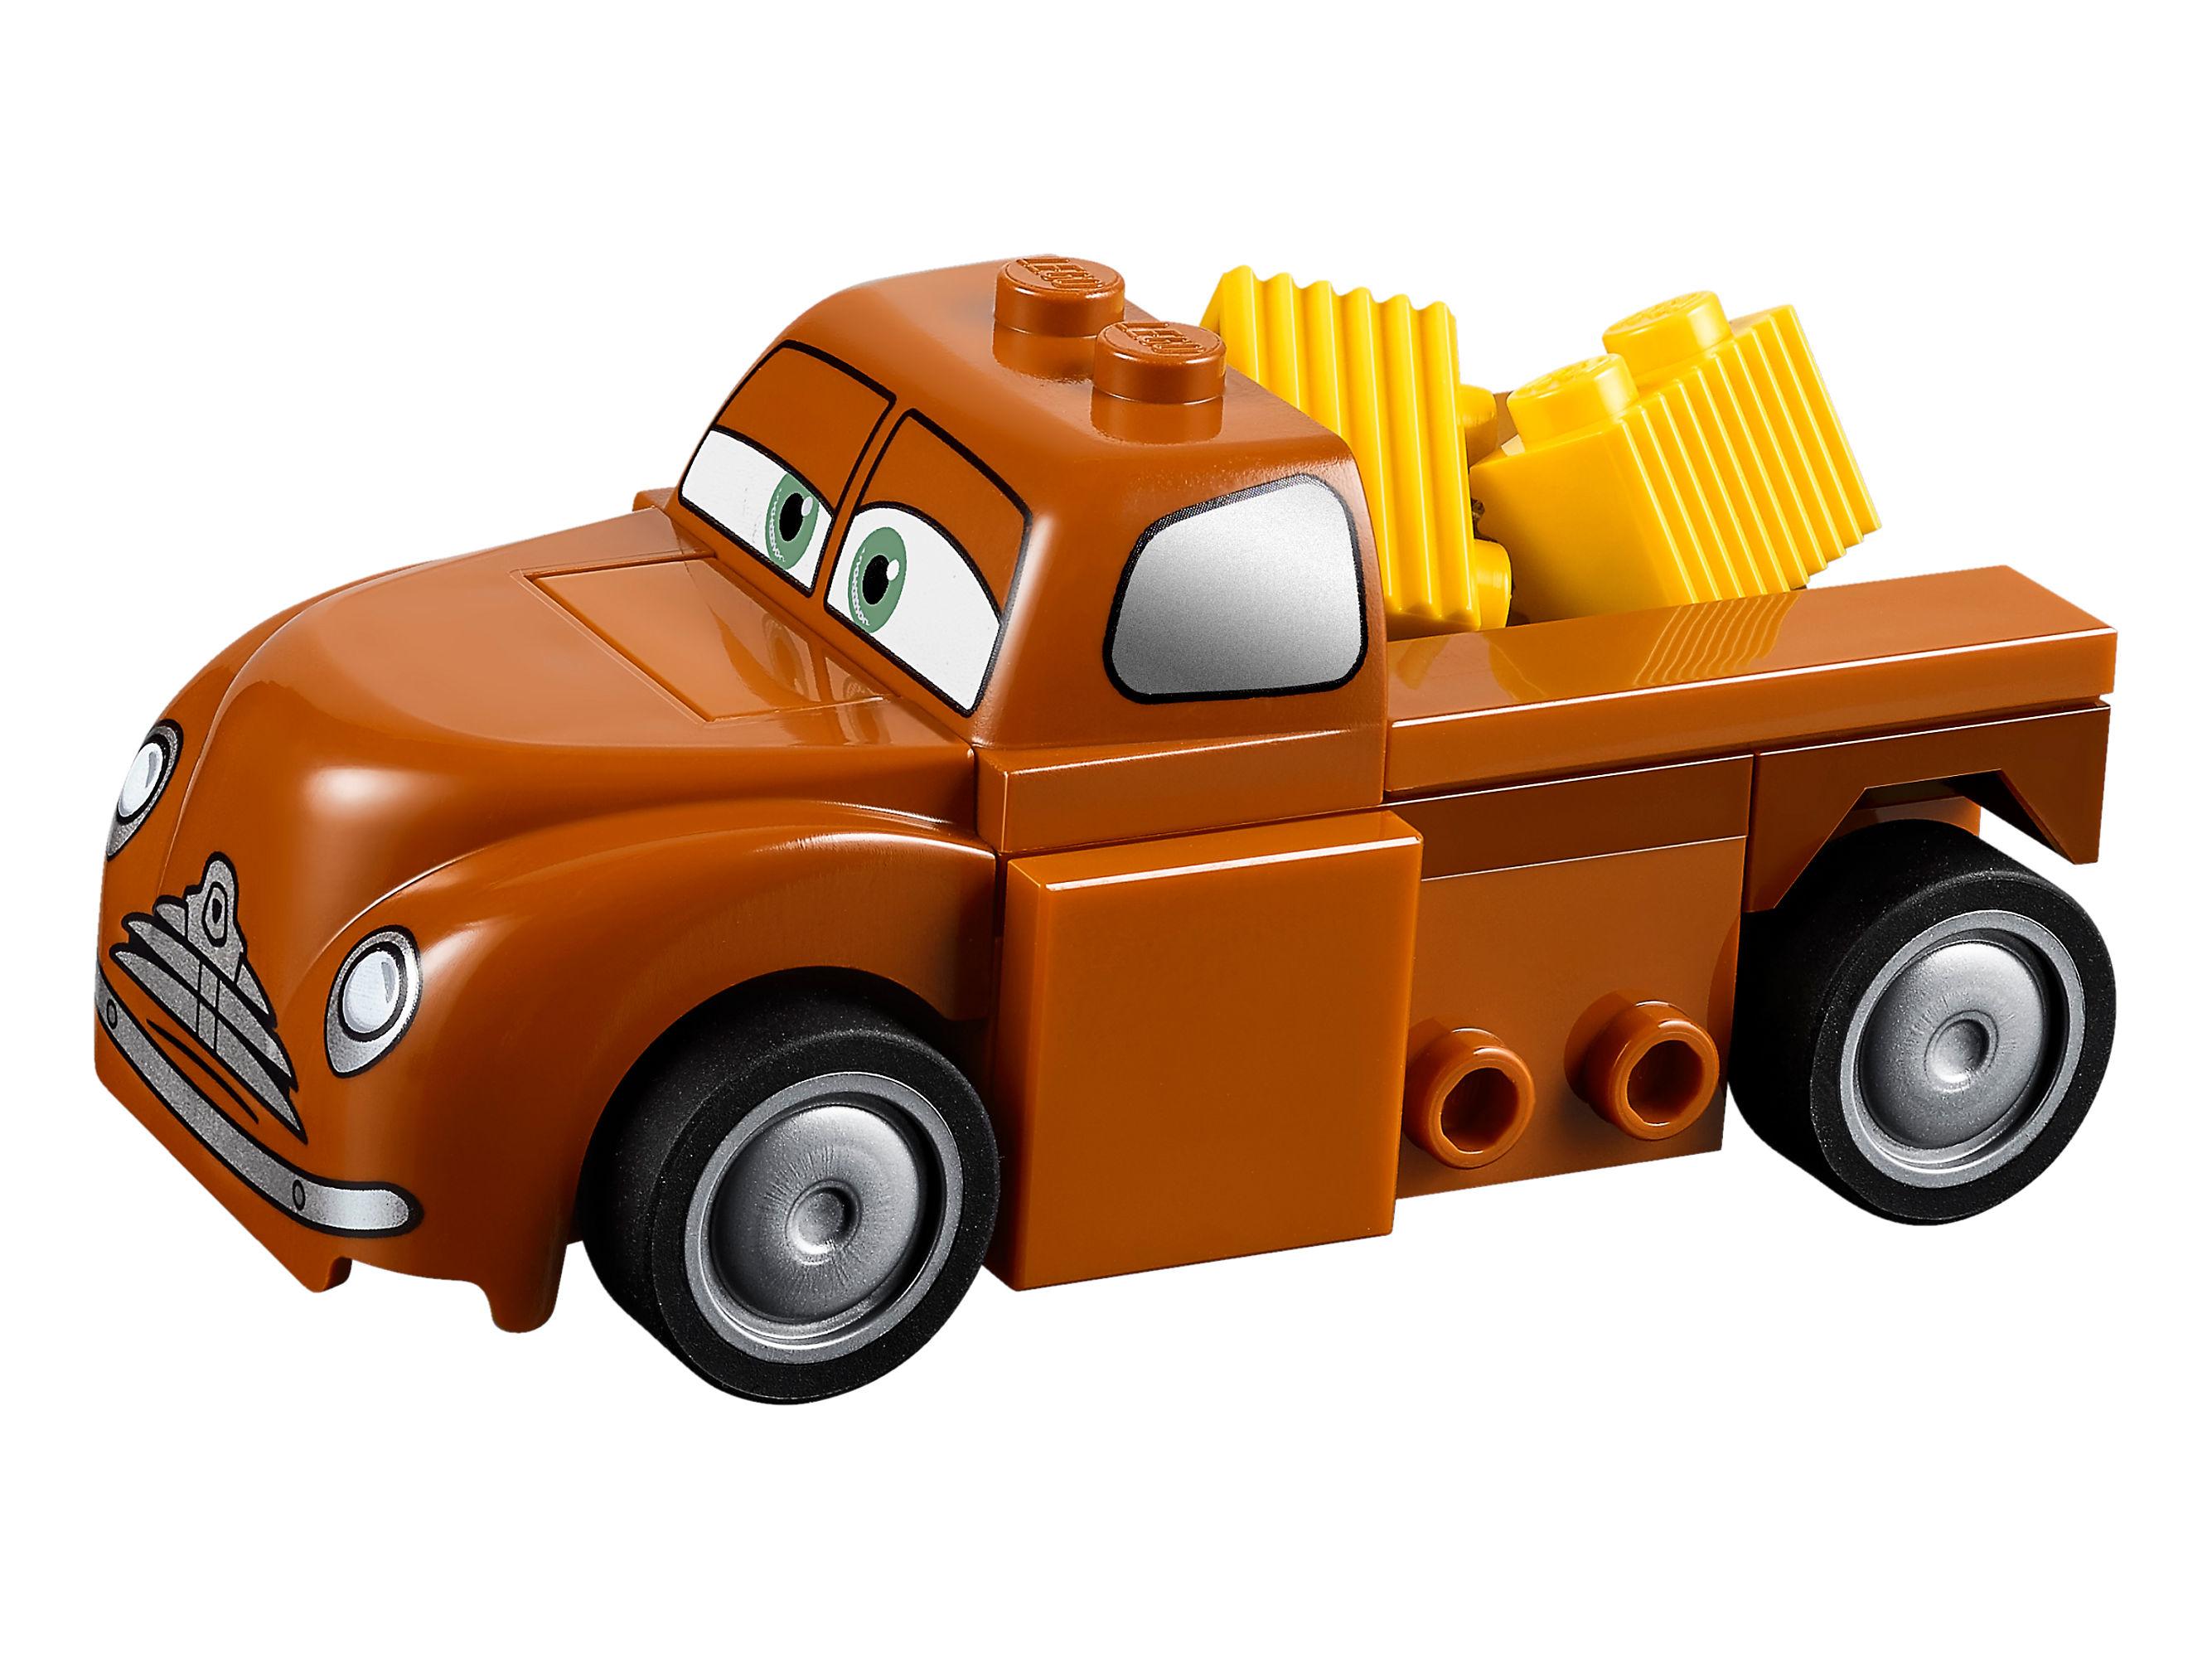 Lego Juniors Smokeys Garage Art Craft intended for dimensions 2669 X 2000